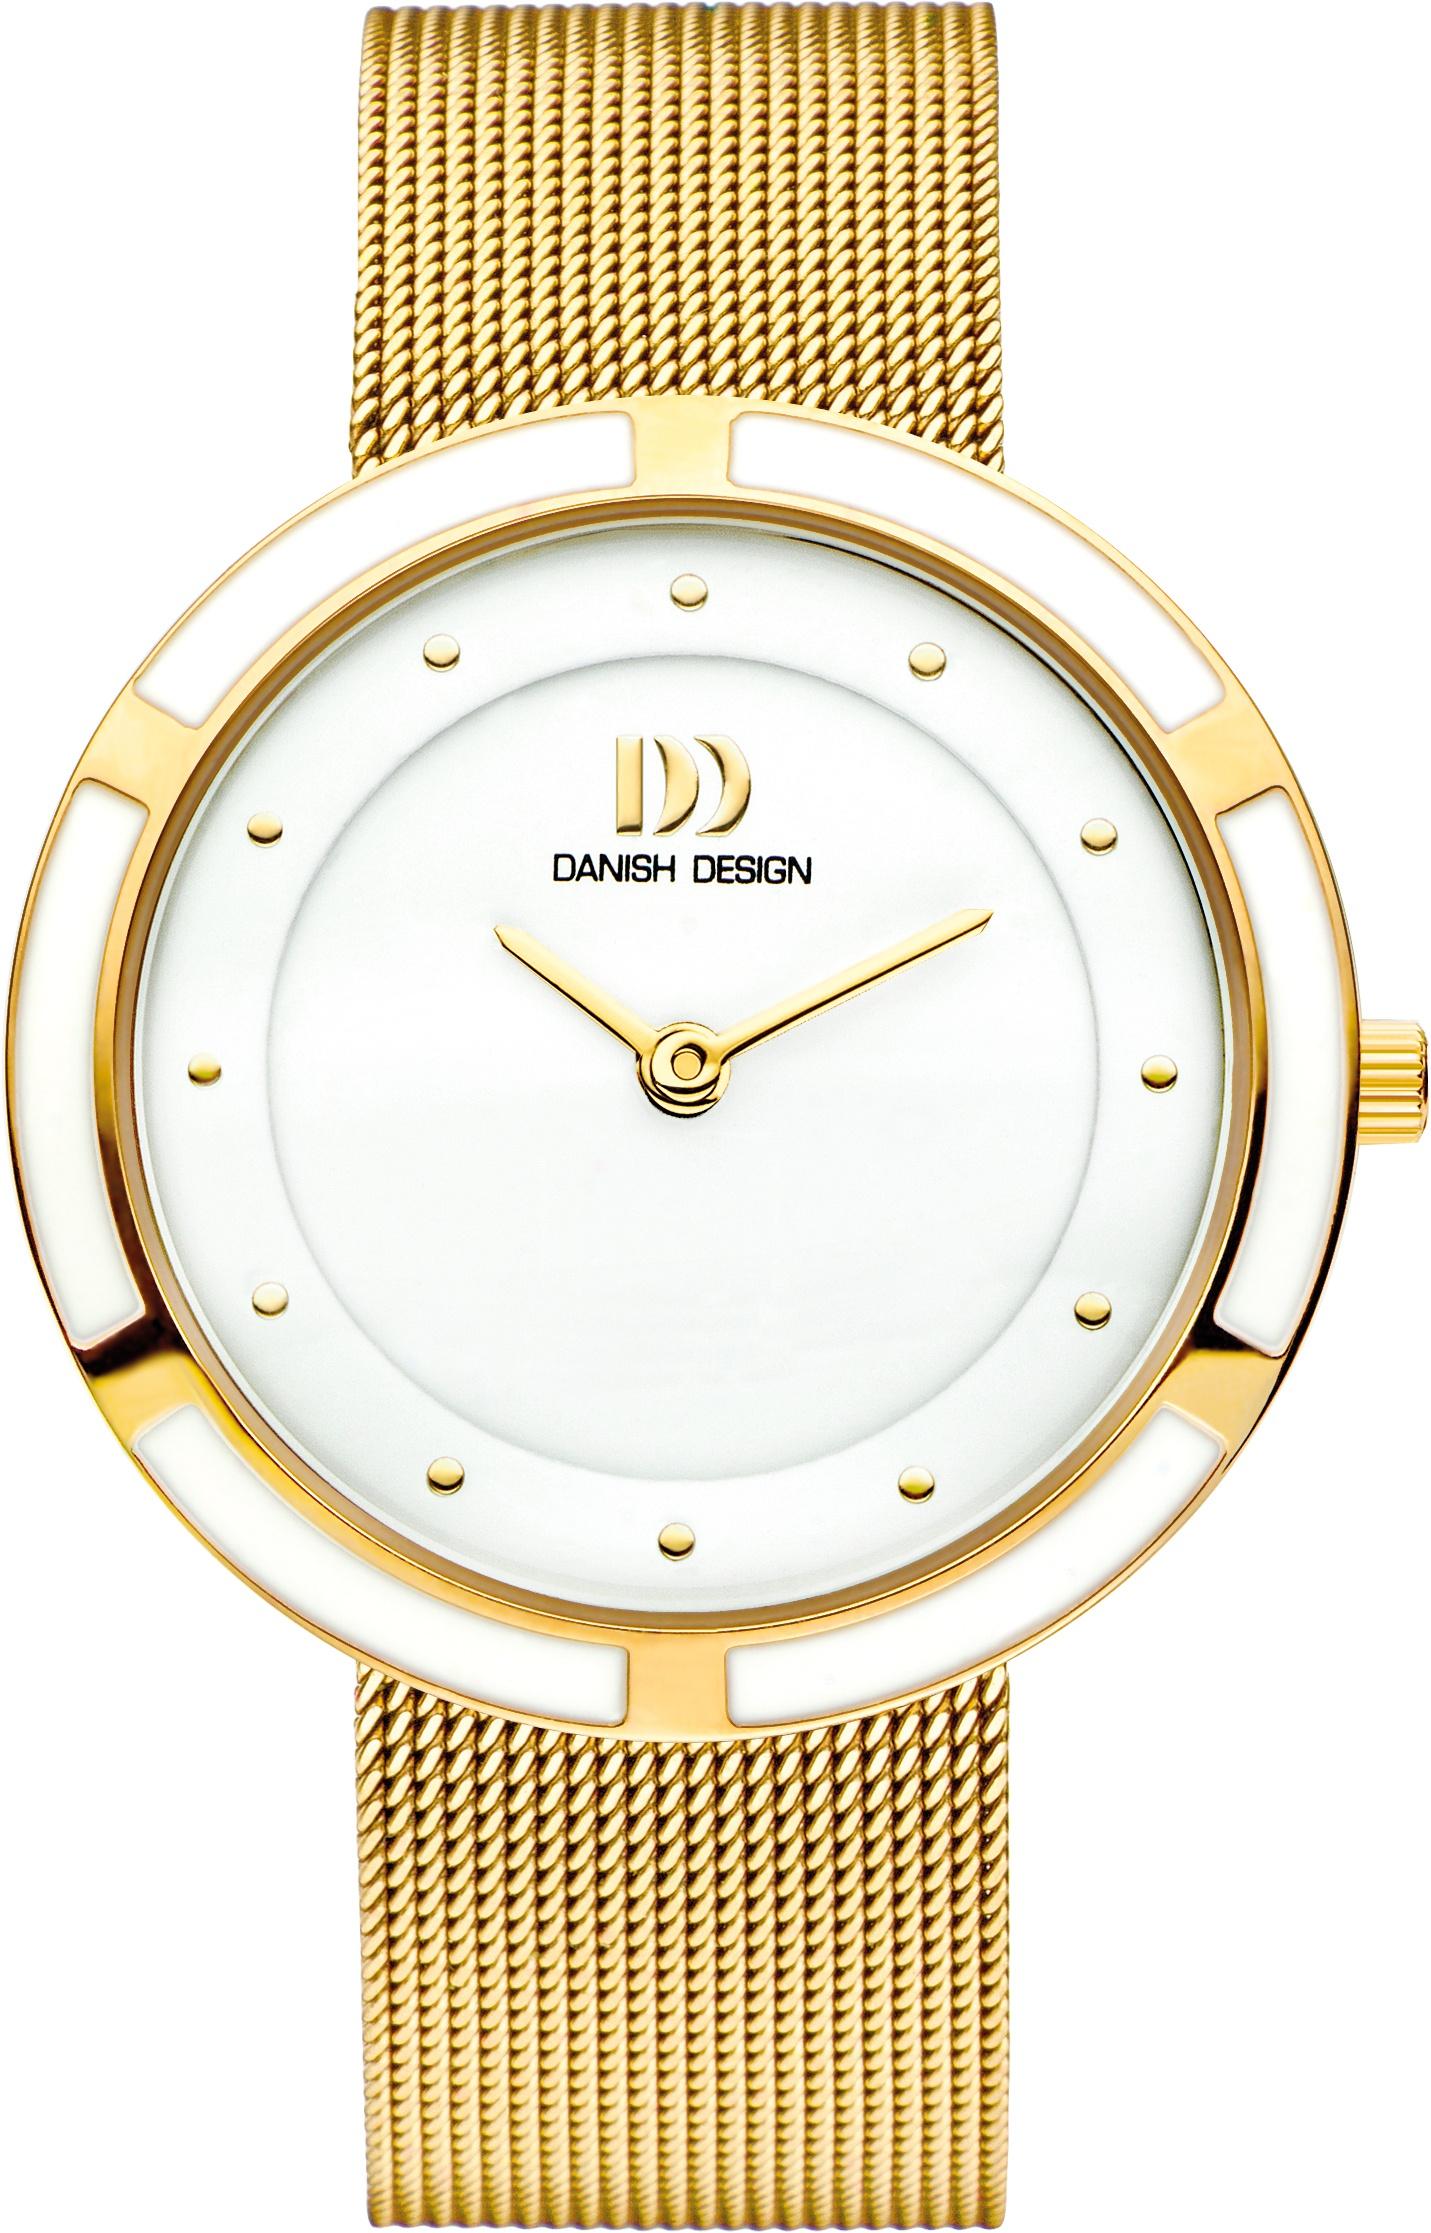 6365aa6703c hodinky danish design casio kombinované hodinky